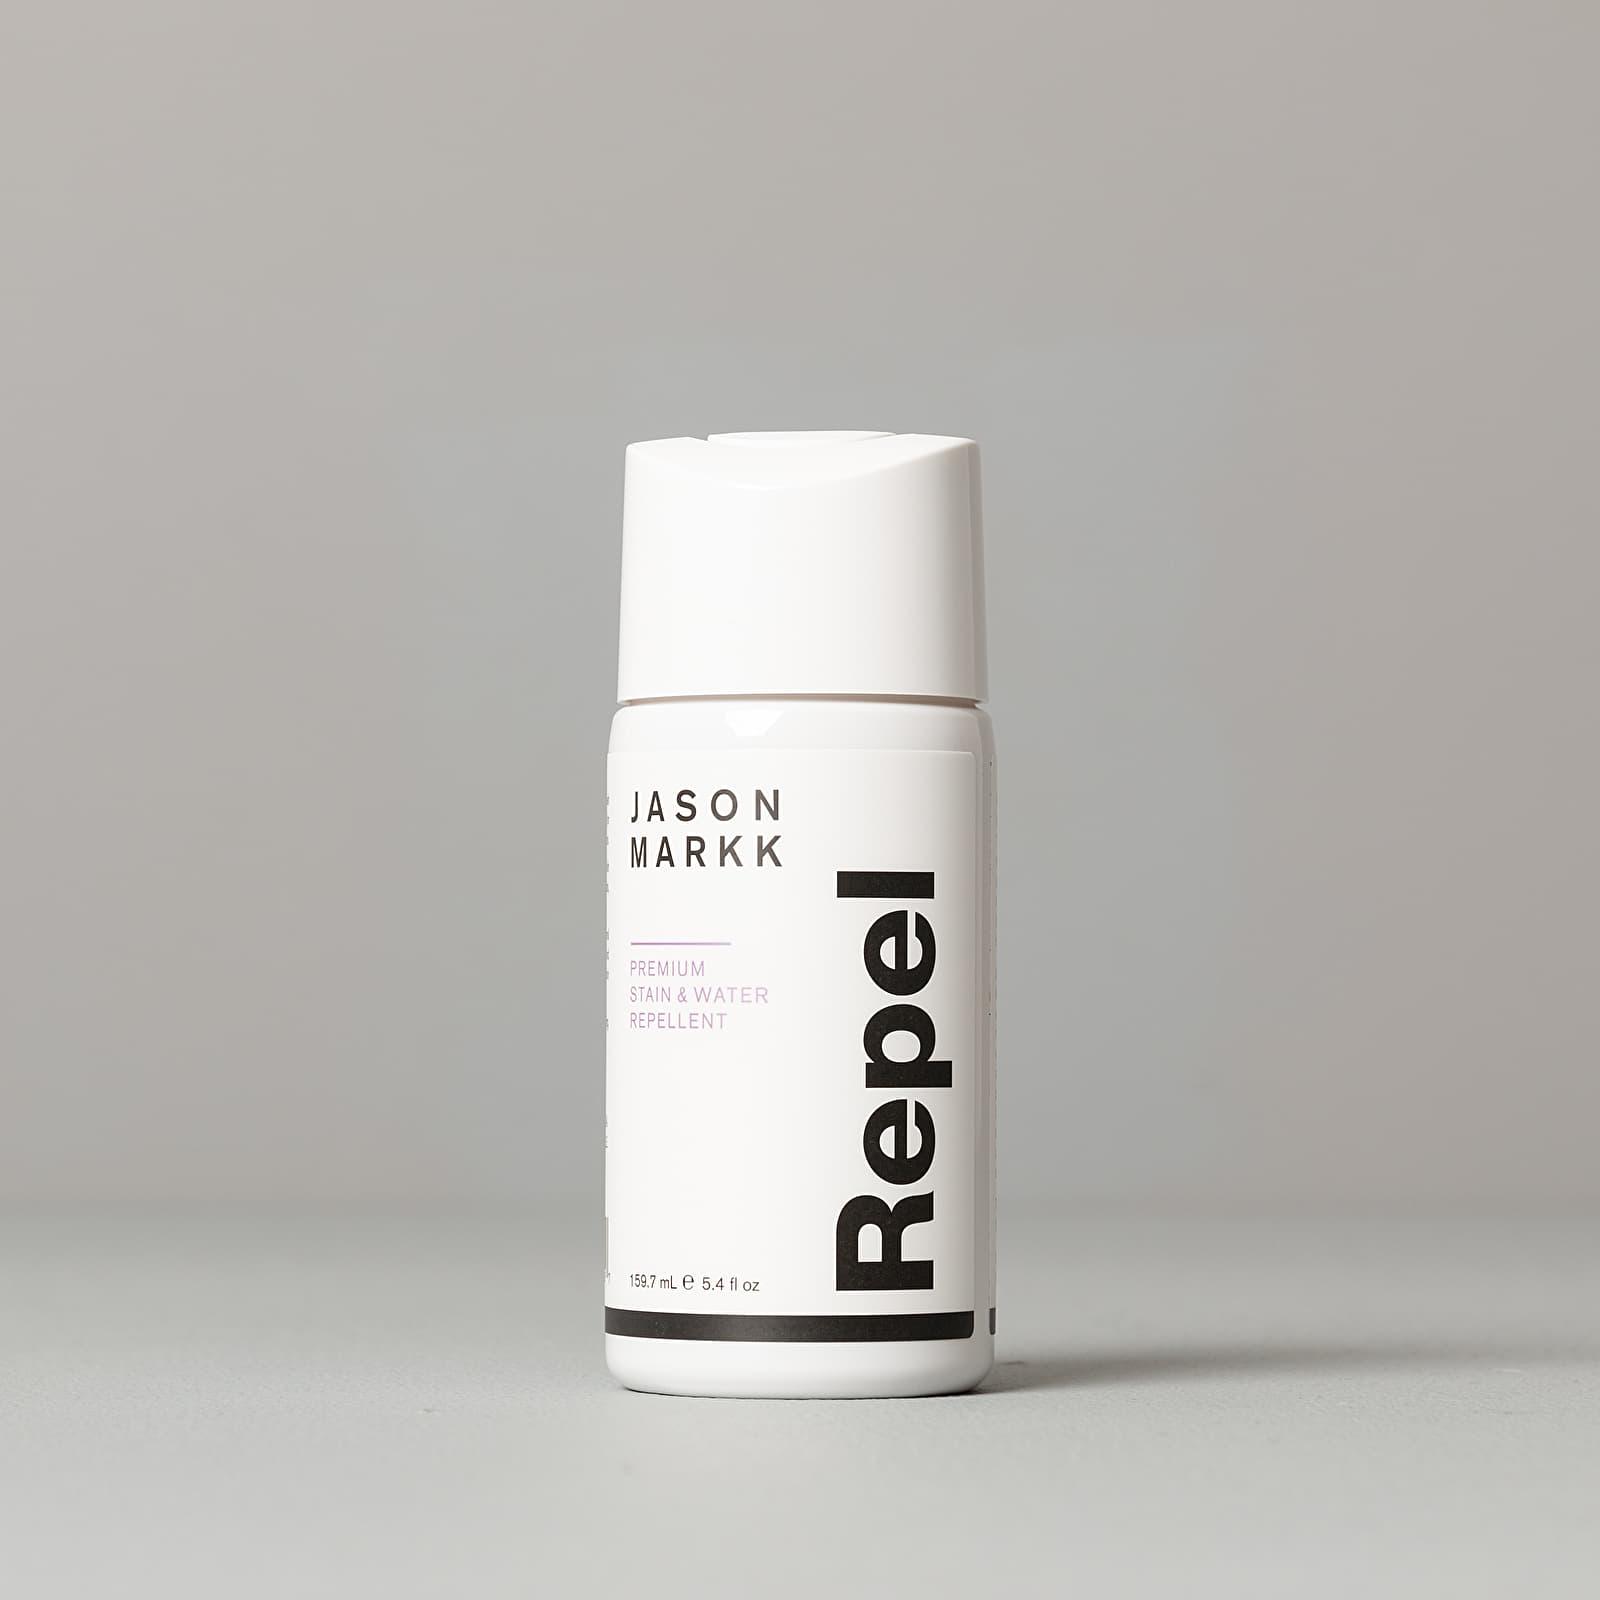 Jason Markk Premium Stain & Water Repellent